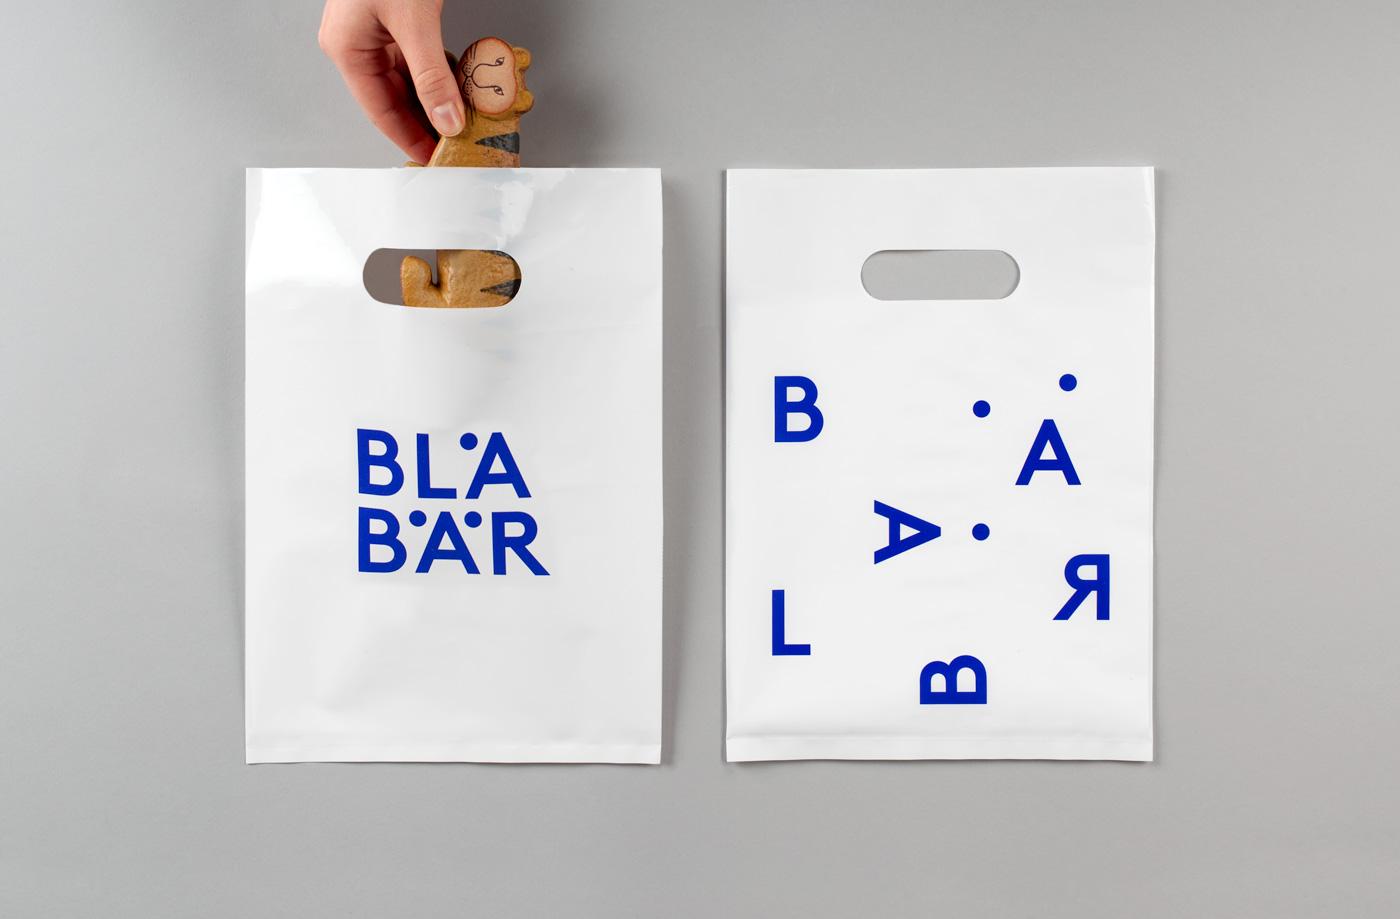 Brand identity and bags by Swedish studio BVD for Blå Bär, an Osaka-based retailer of Scandinavian goods